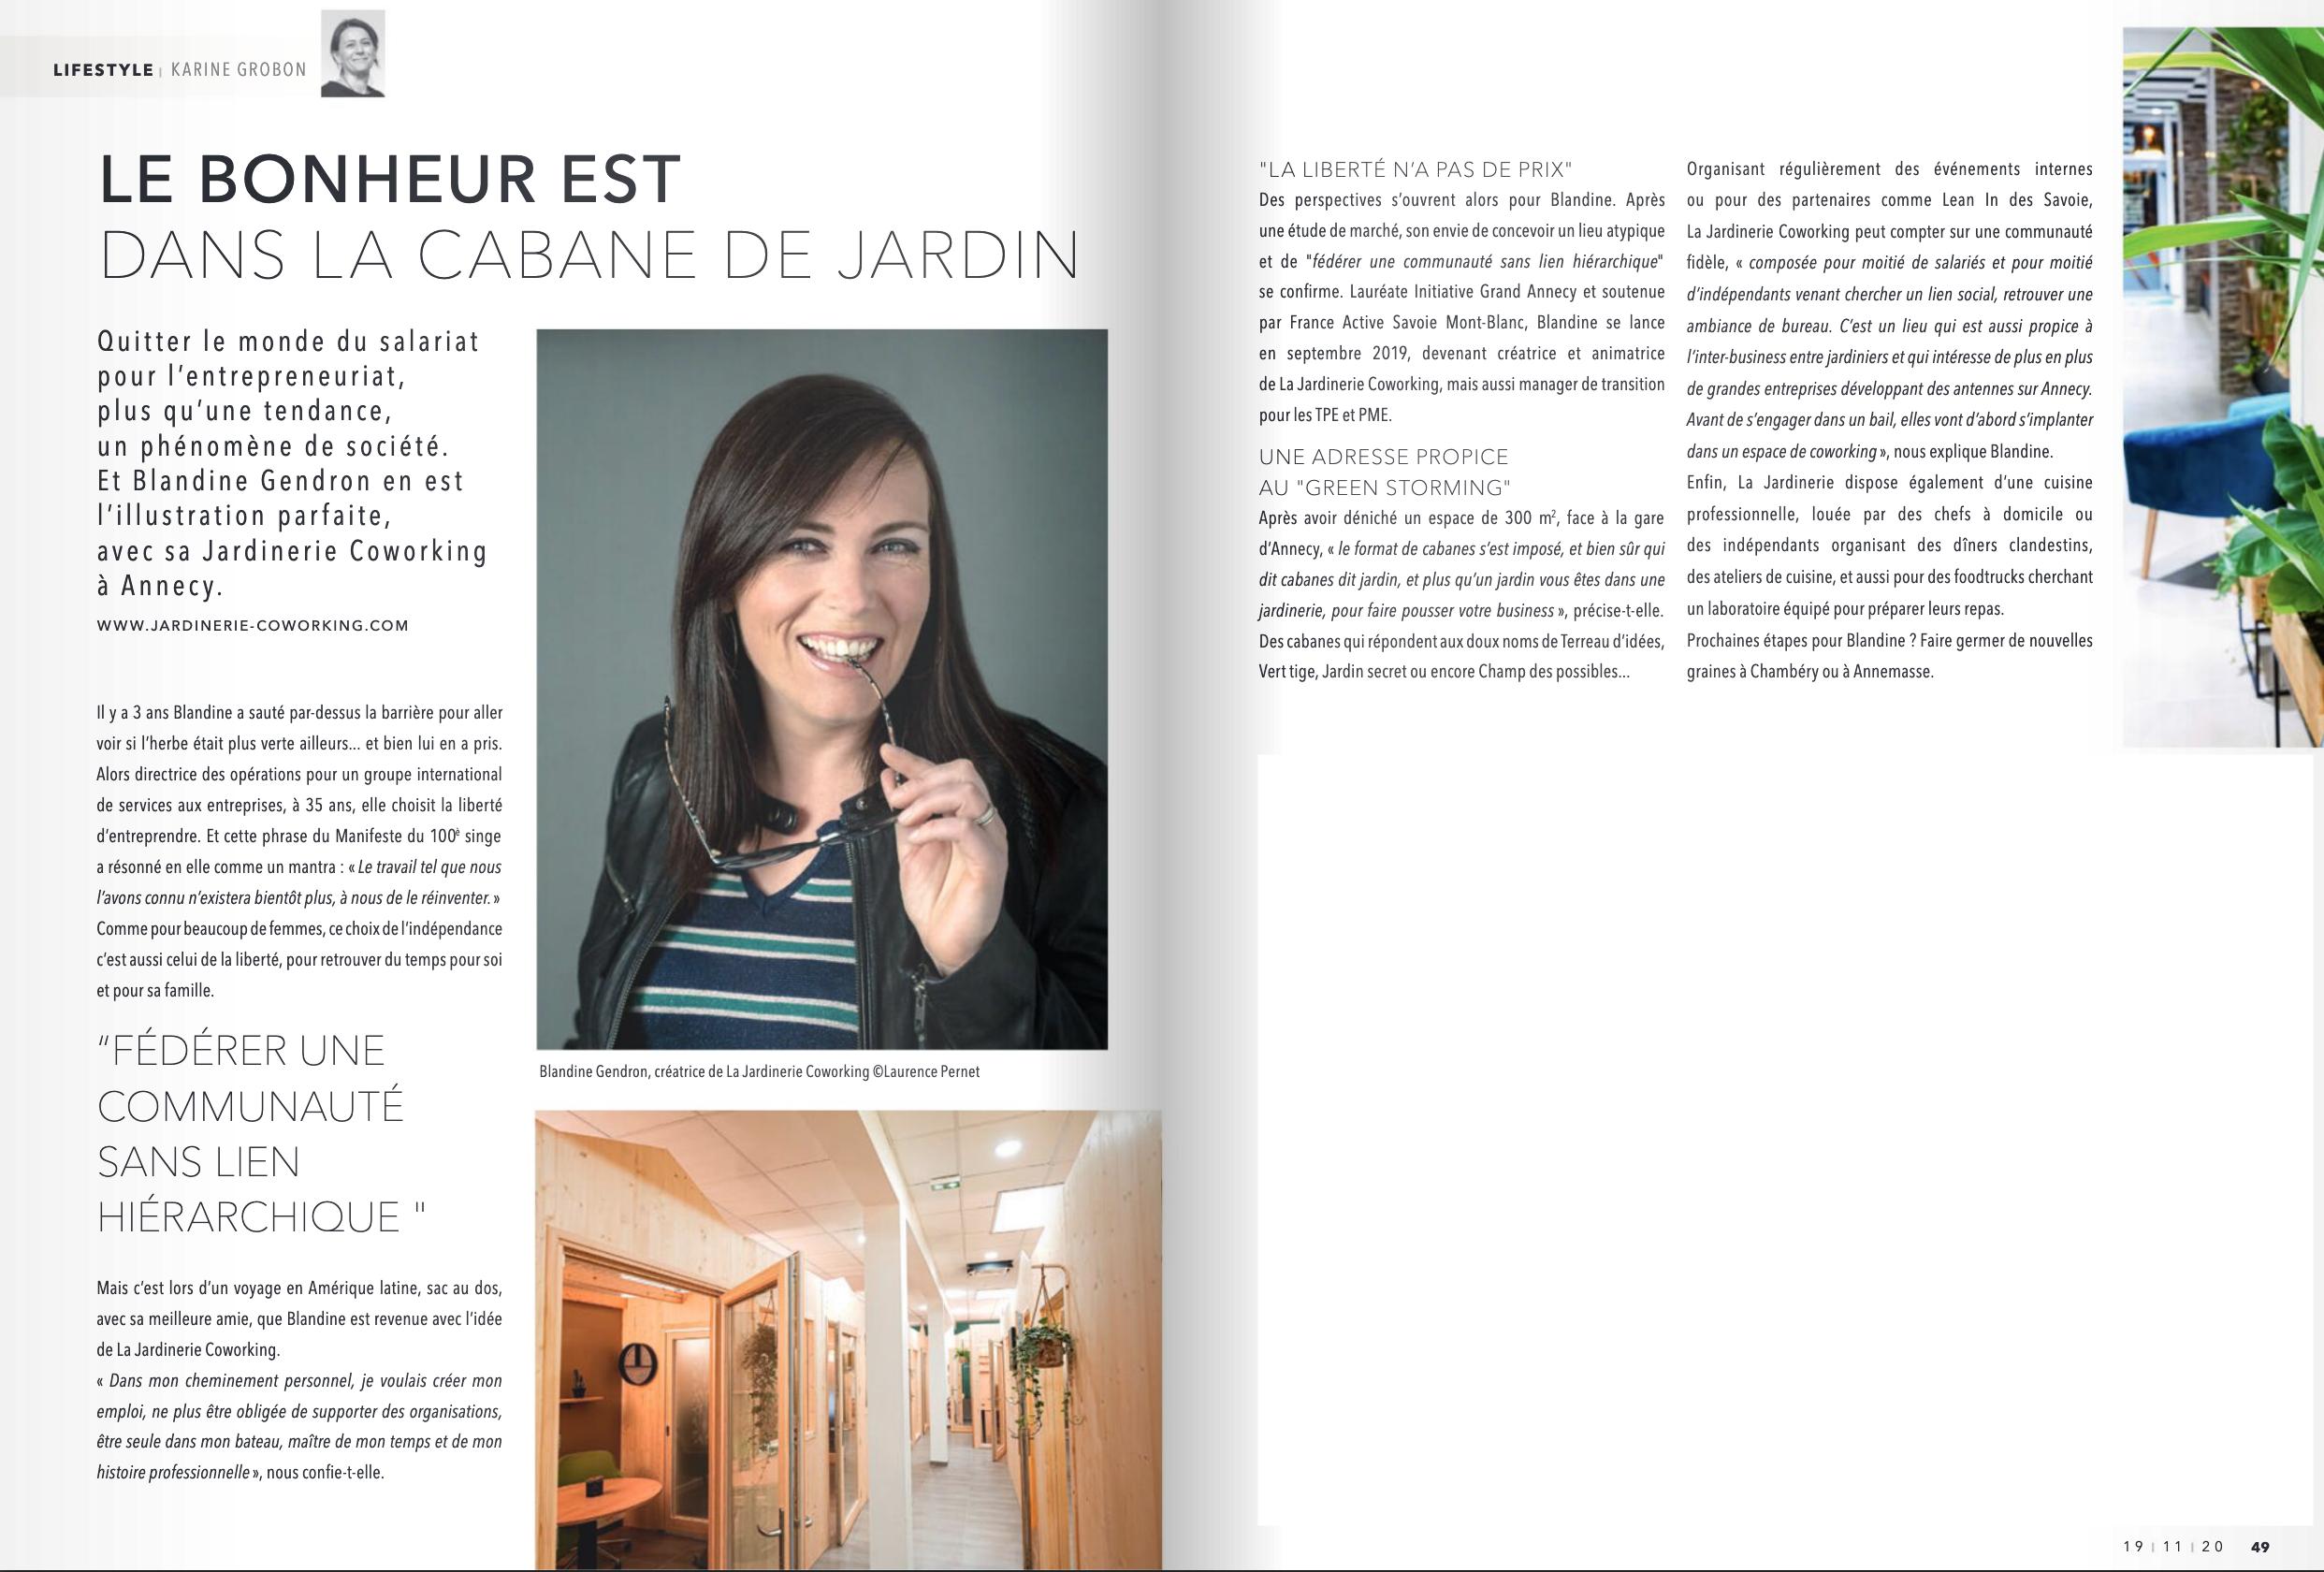 Blandine Gendron Jardinerie Coworking Nov. 20